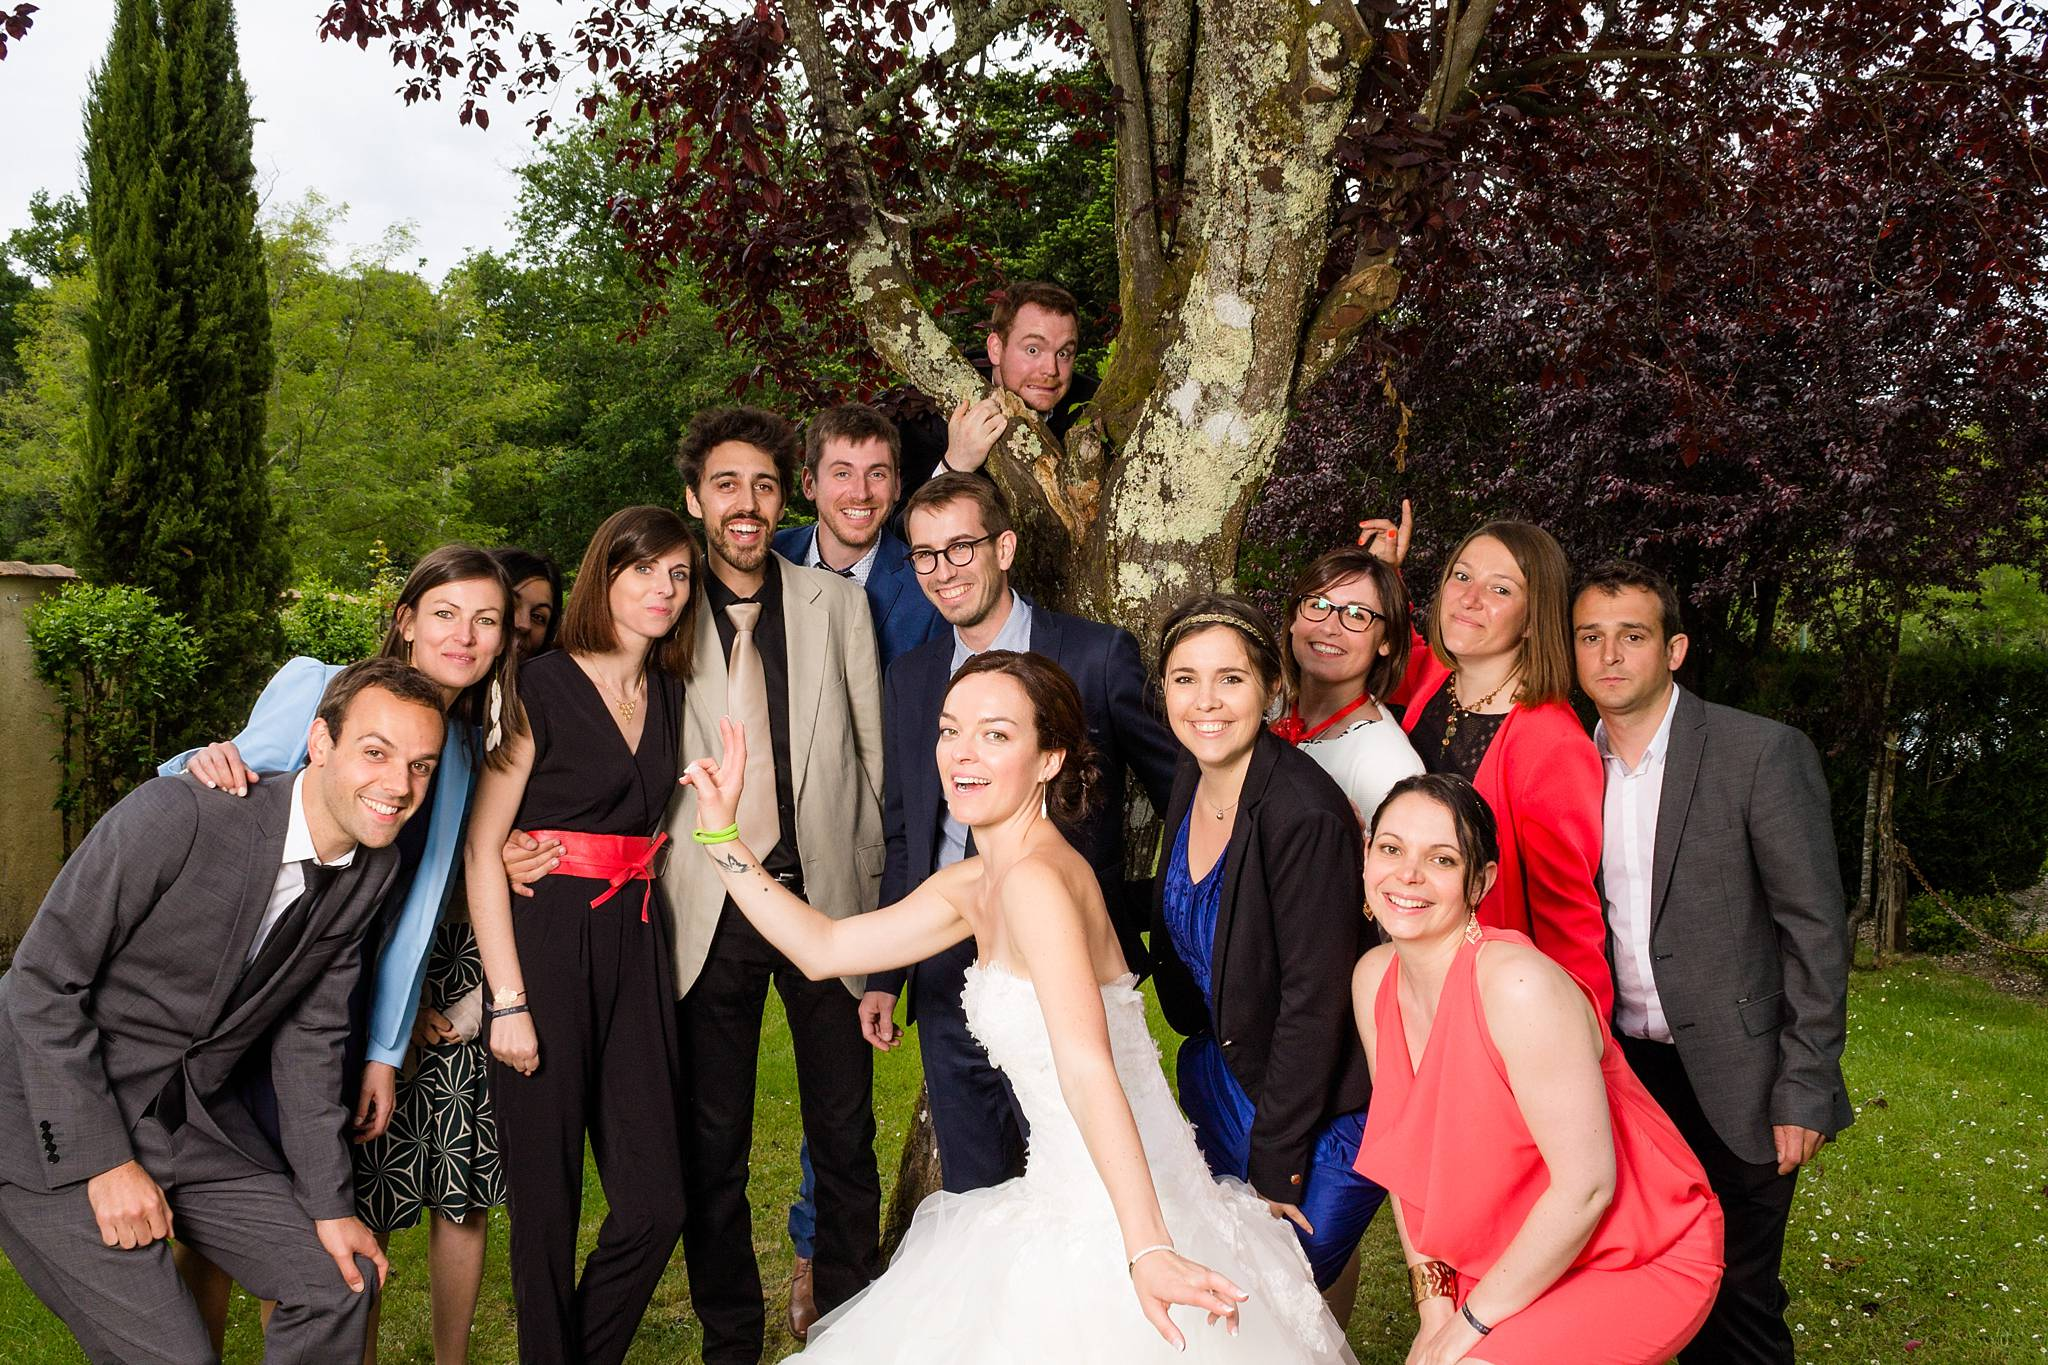 08_photobooth-mariage-bordeaux-gironde-dordogne-charentes-alexandre-roschewitz-photographies_2048px